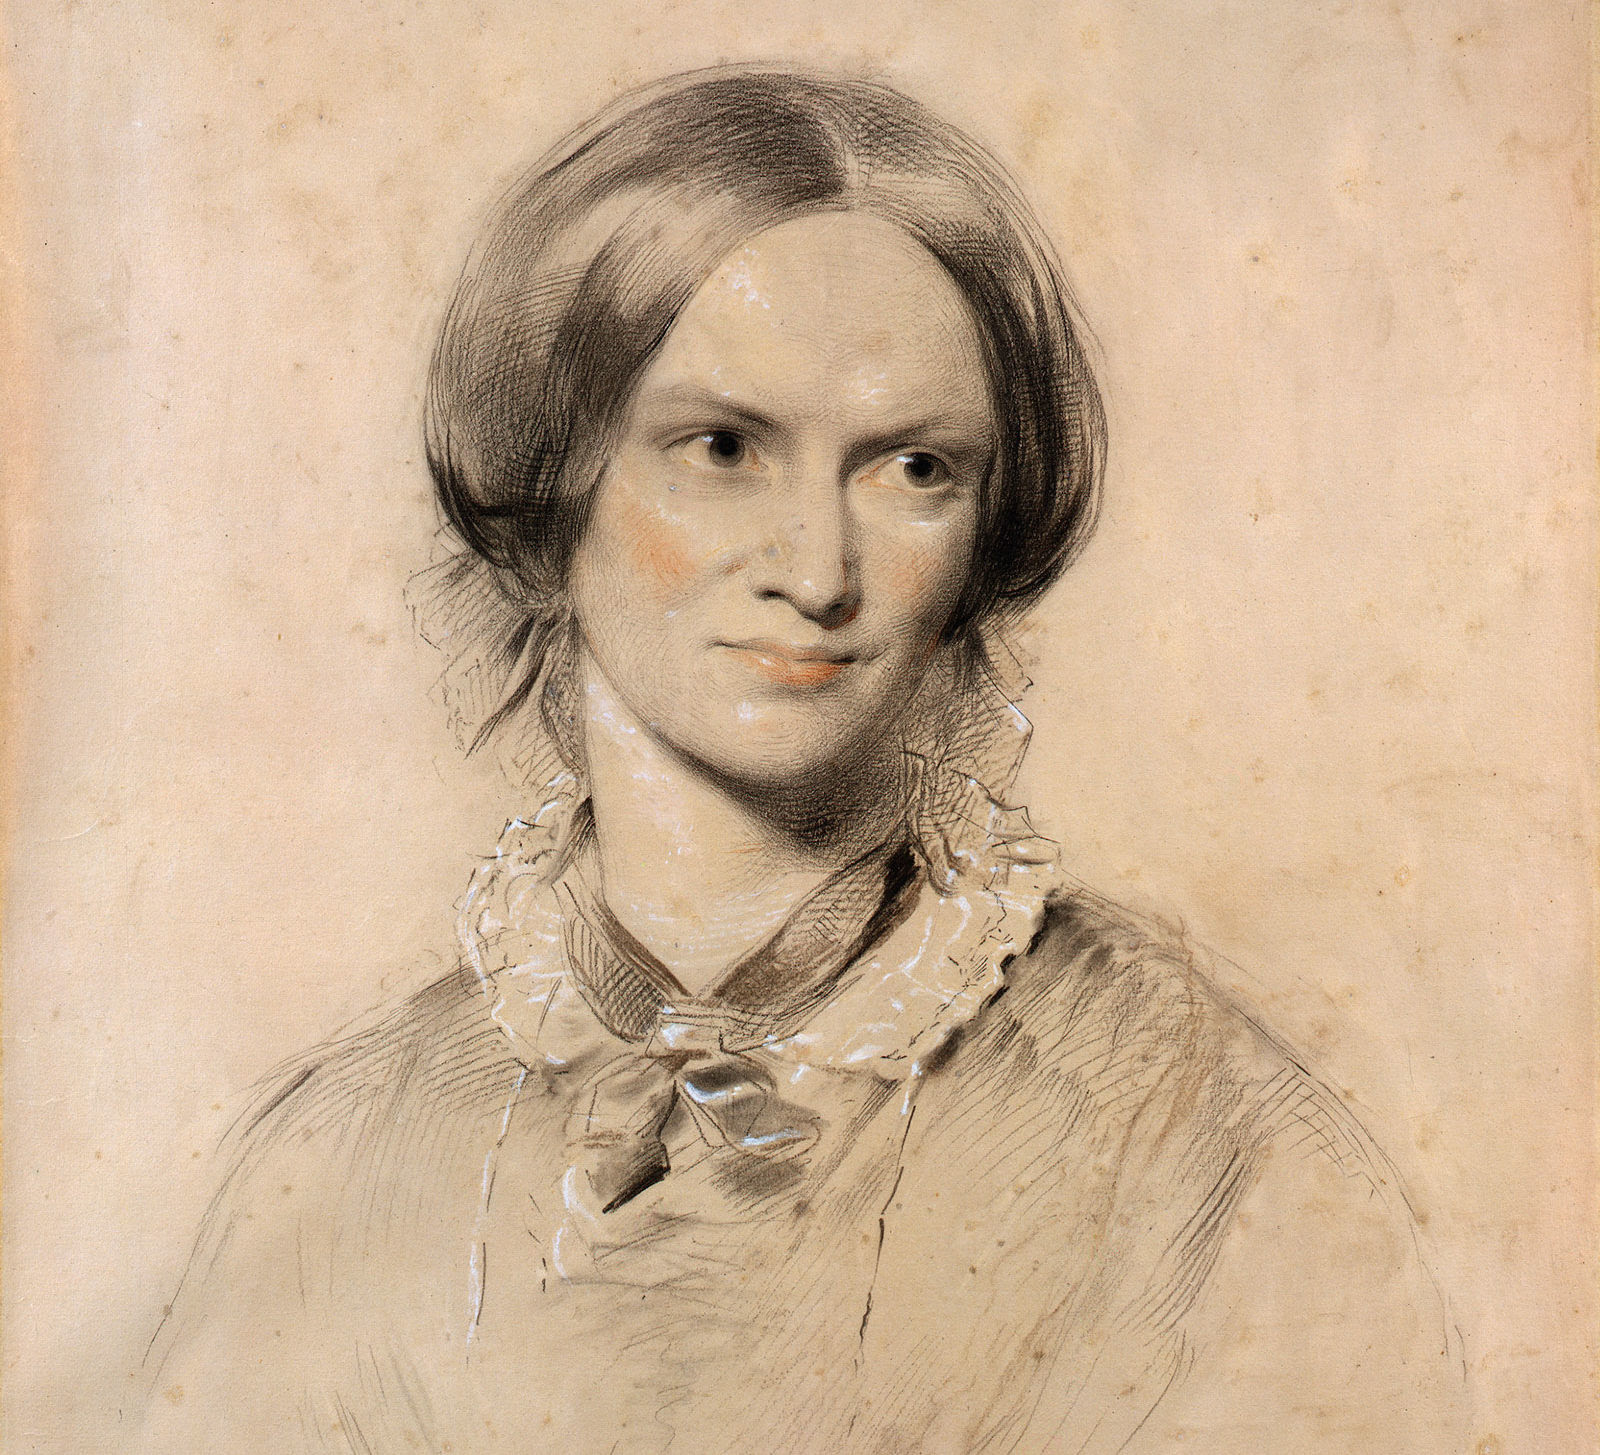 George Richmond: Charlotte Brontë, 1850